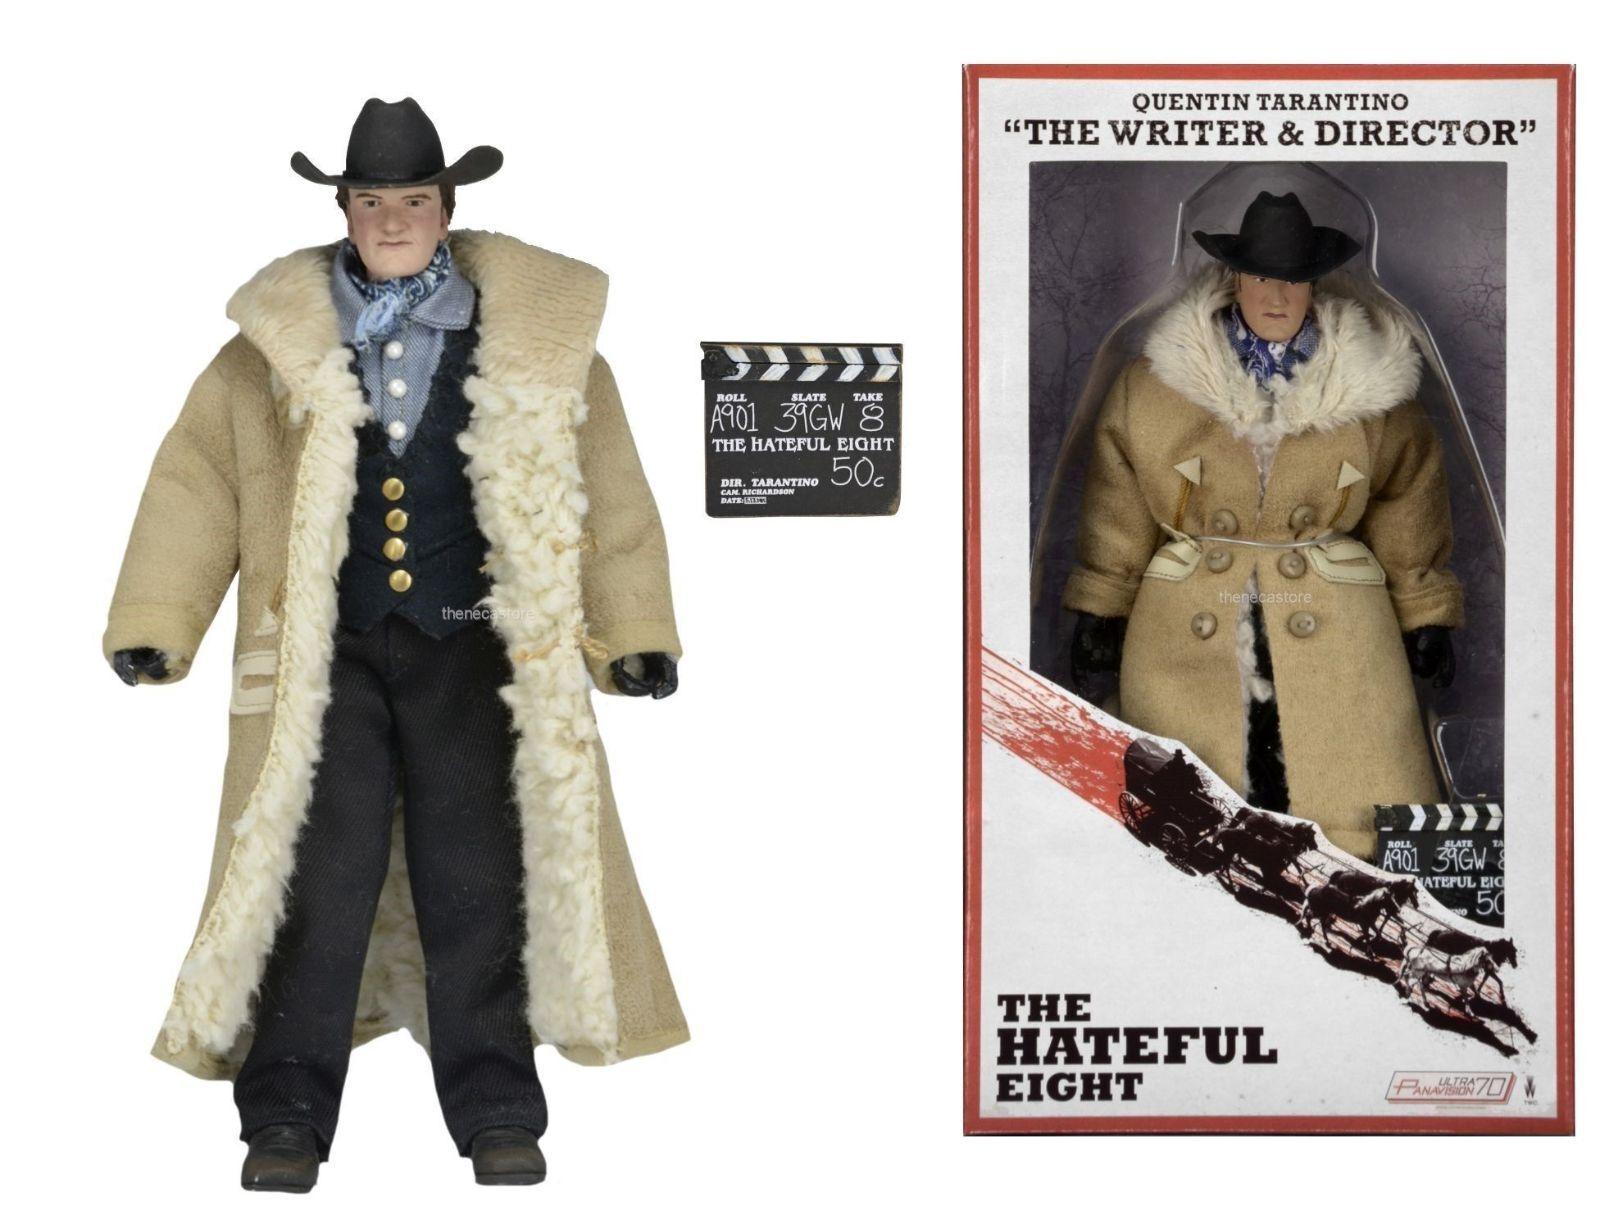 NECA The The The Hateful Eight Bob Quentin Tarantino Writer & Director 8  Figure Doll cad6ec